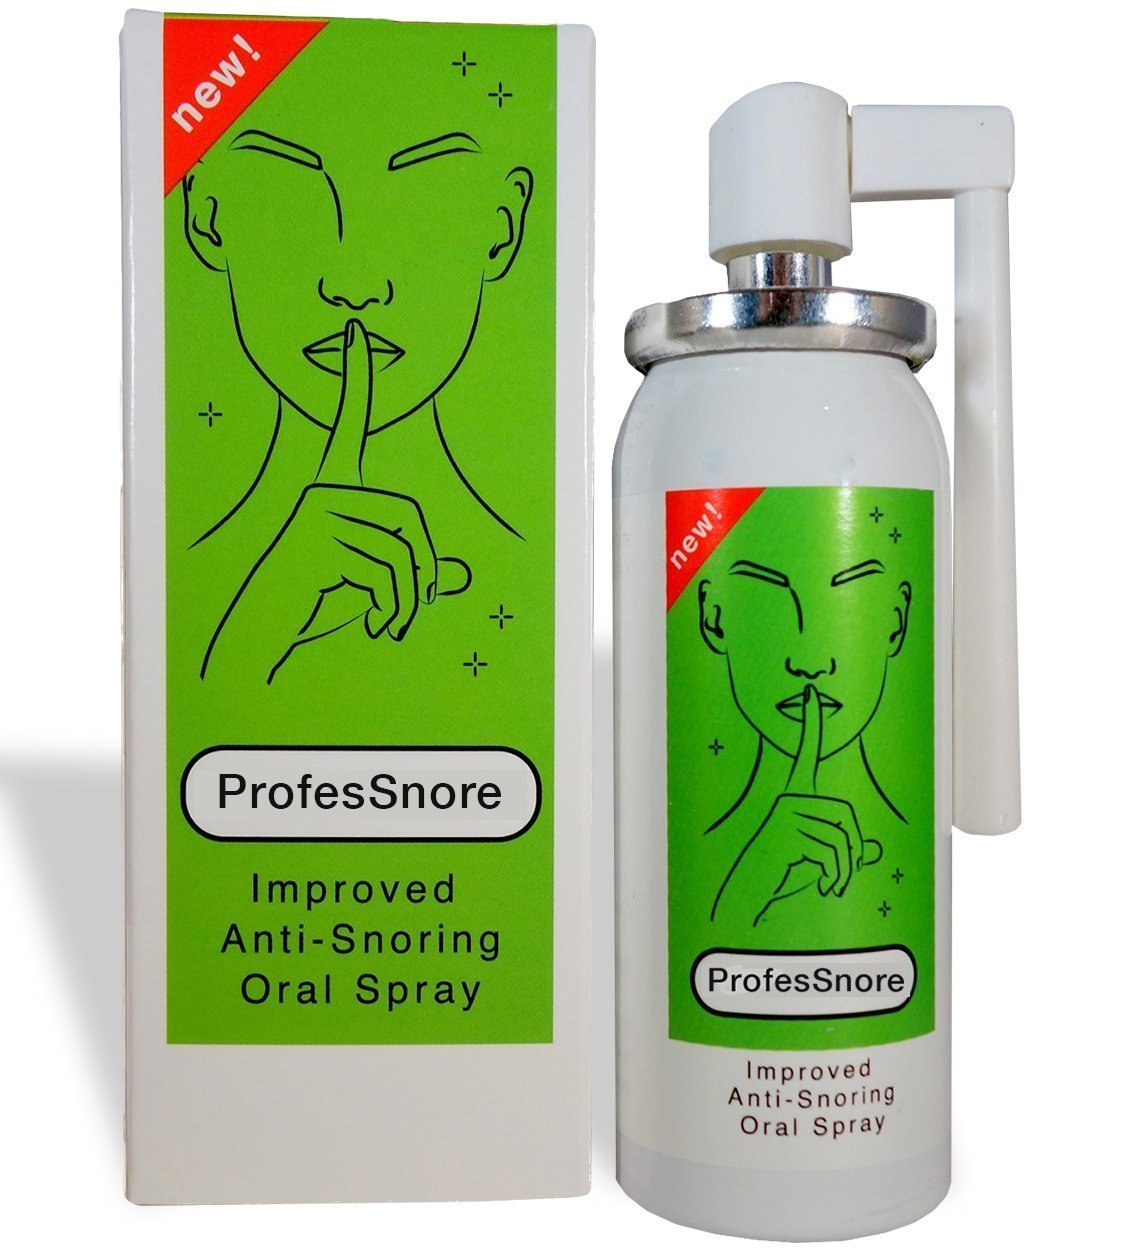 Snore Solutions Anti Snoring Stop Relief Spray ProfesSnore 1.69 Fl oz (50 ml)